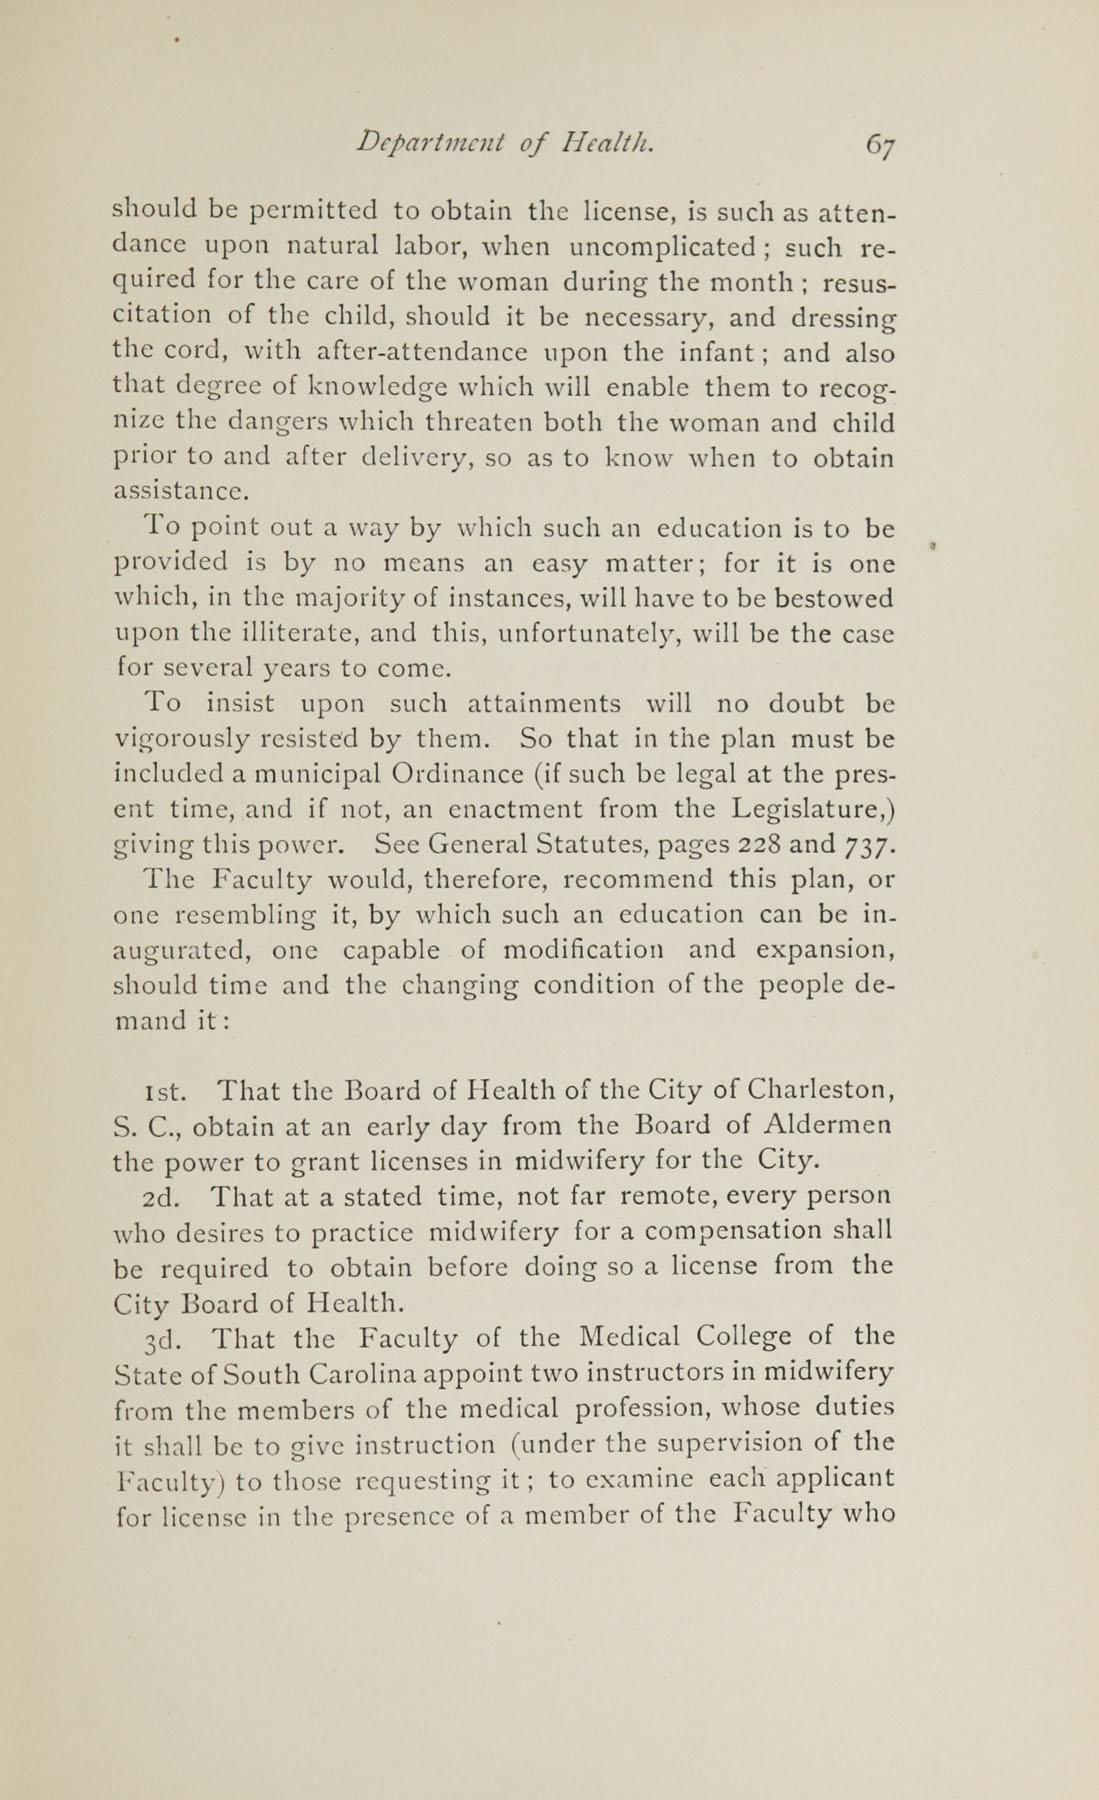 Charleston Yearbook, 1882, page 67